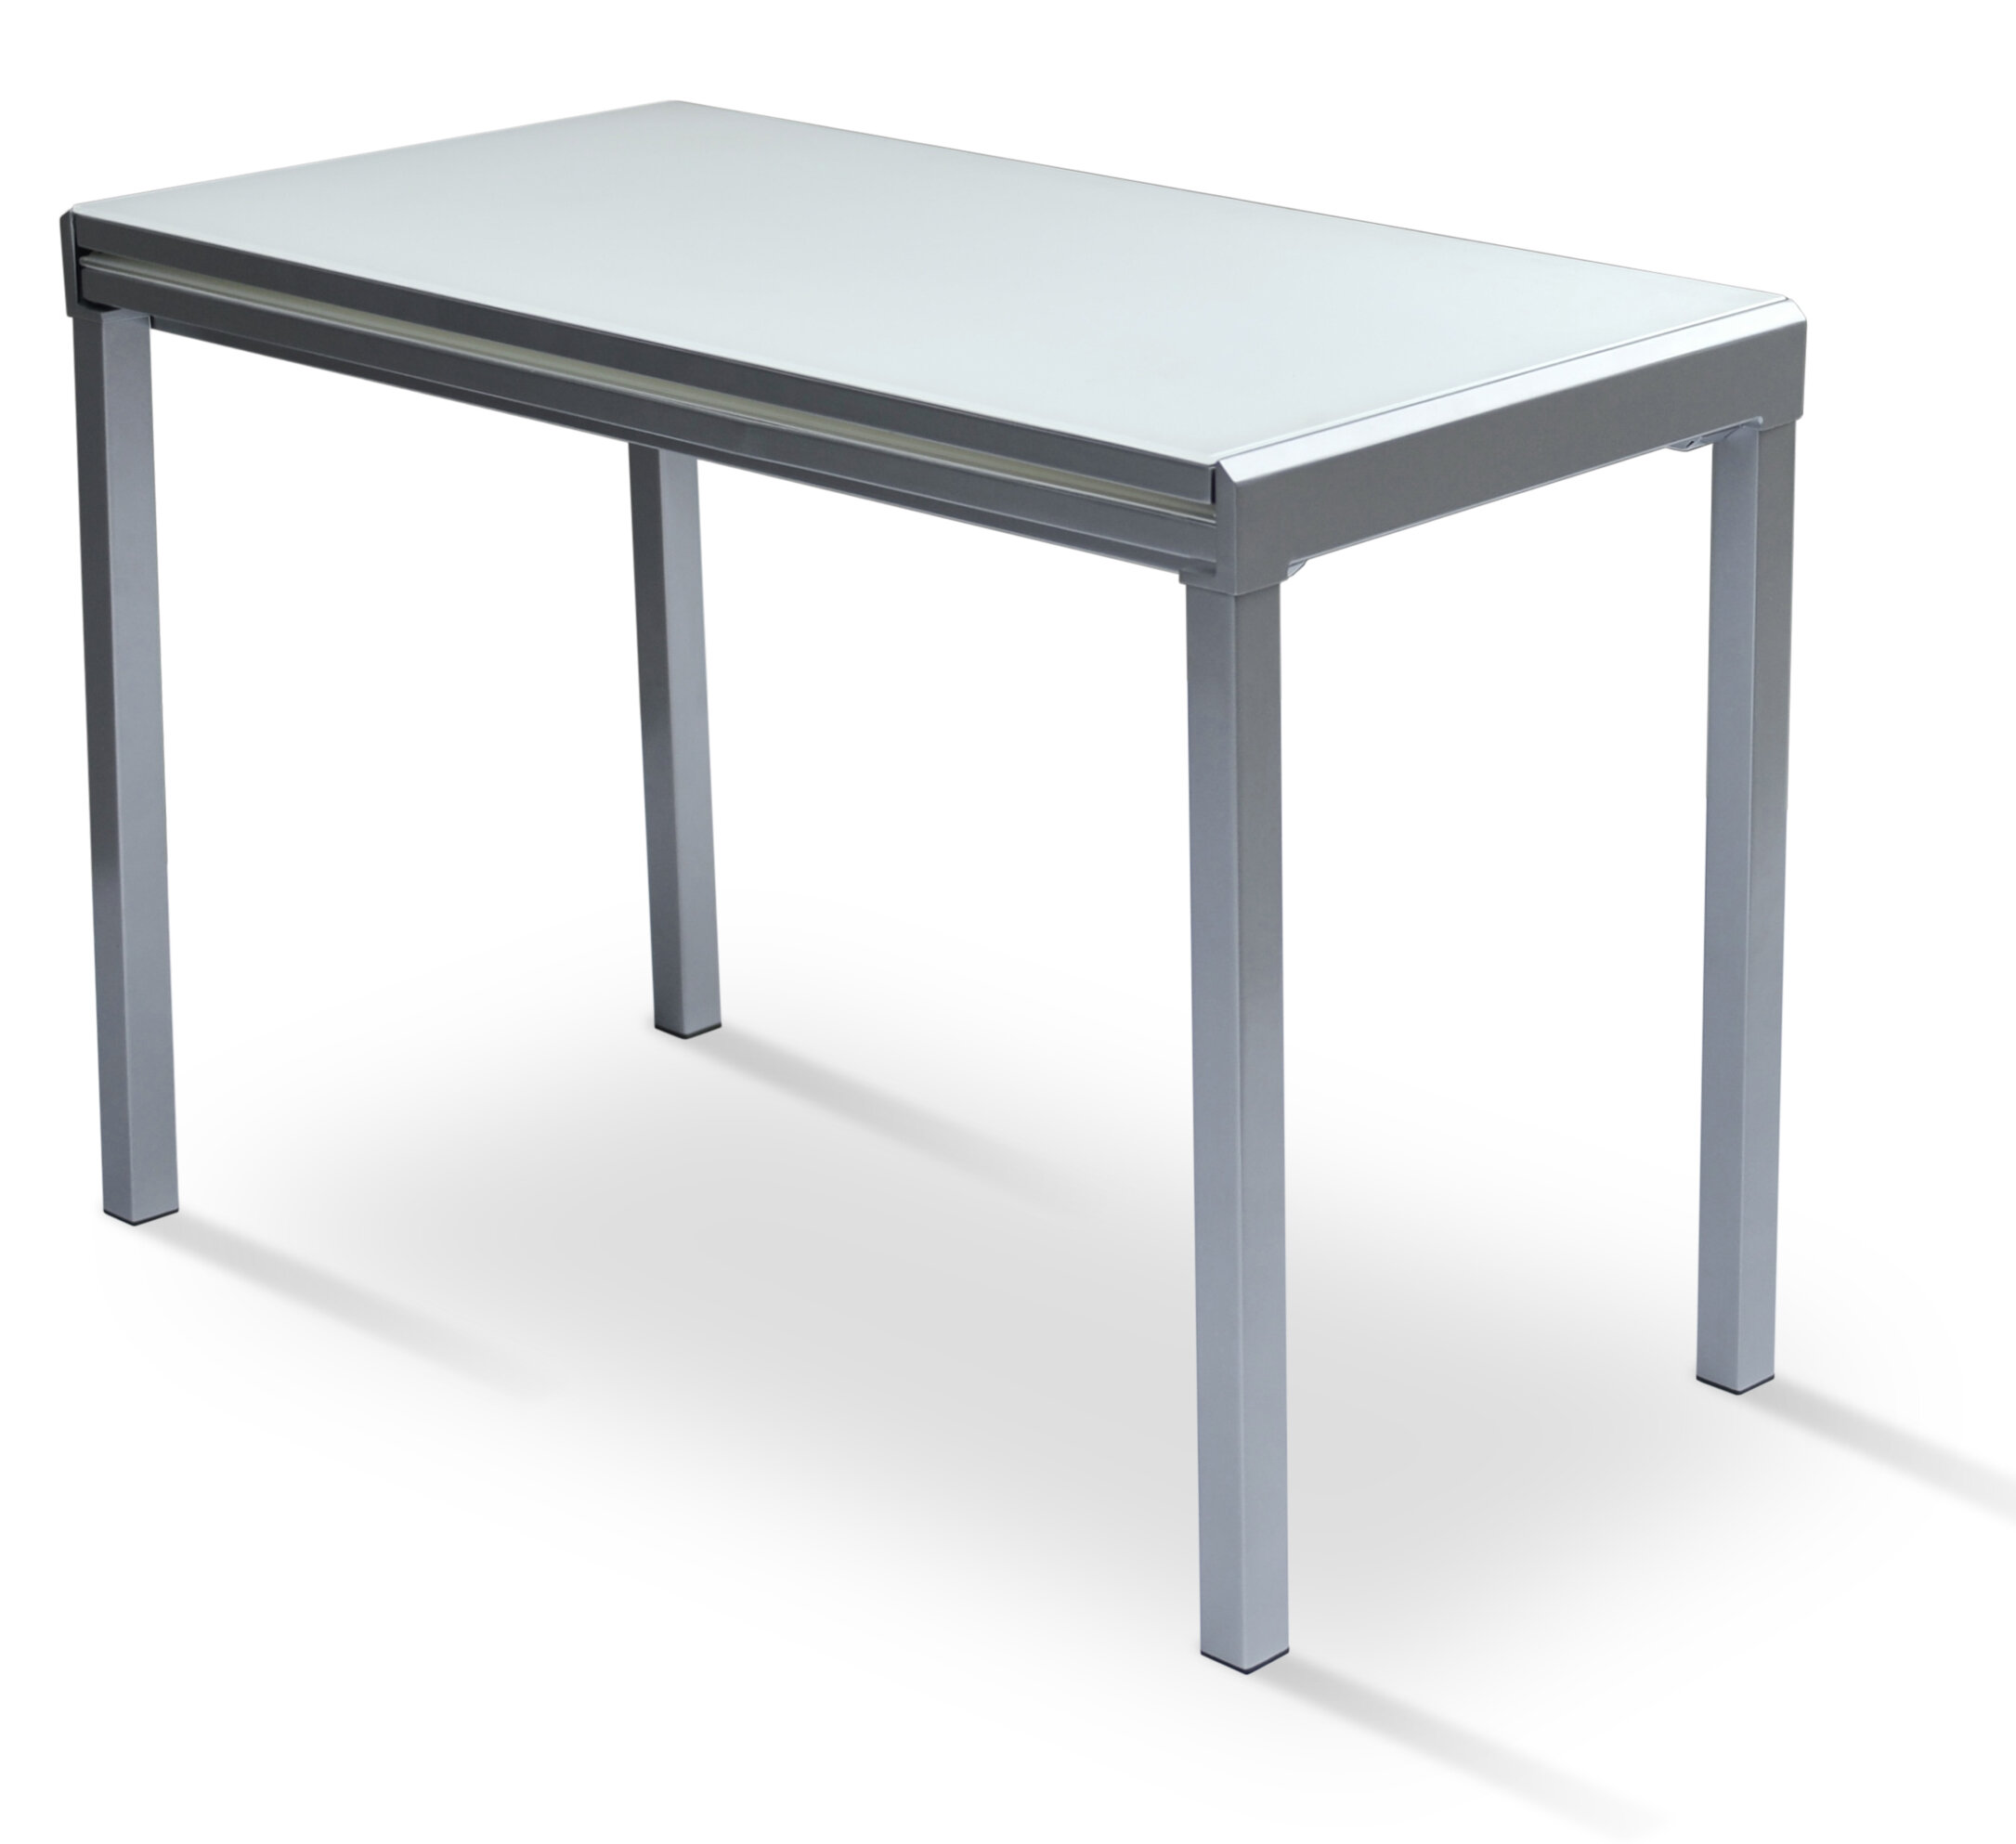 Sohoconcept Modern Extendable Dining Table Wayfair